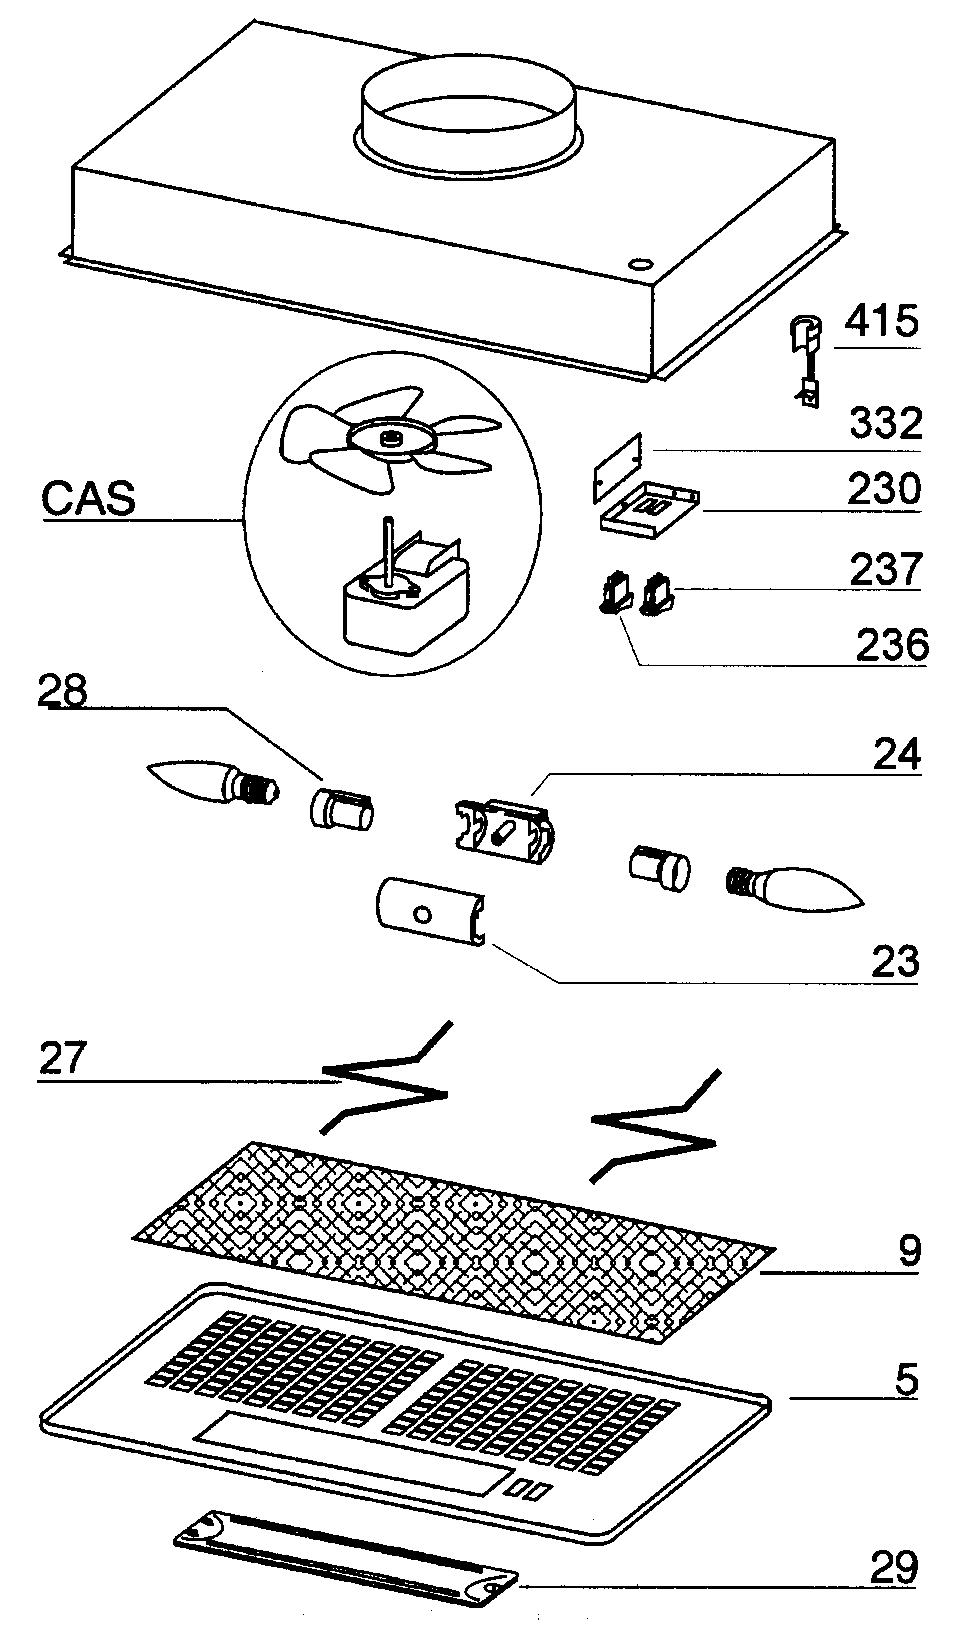 Broan 655 Wiring Diagram : 24 Wiring Diagram Images